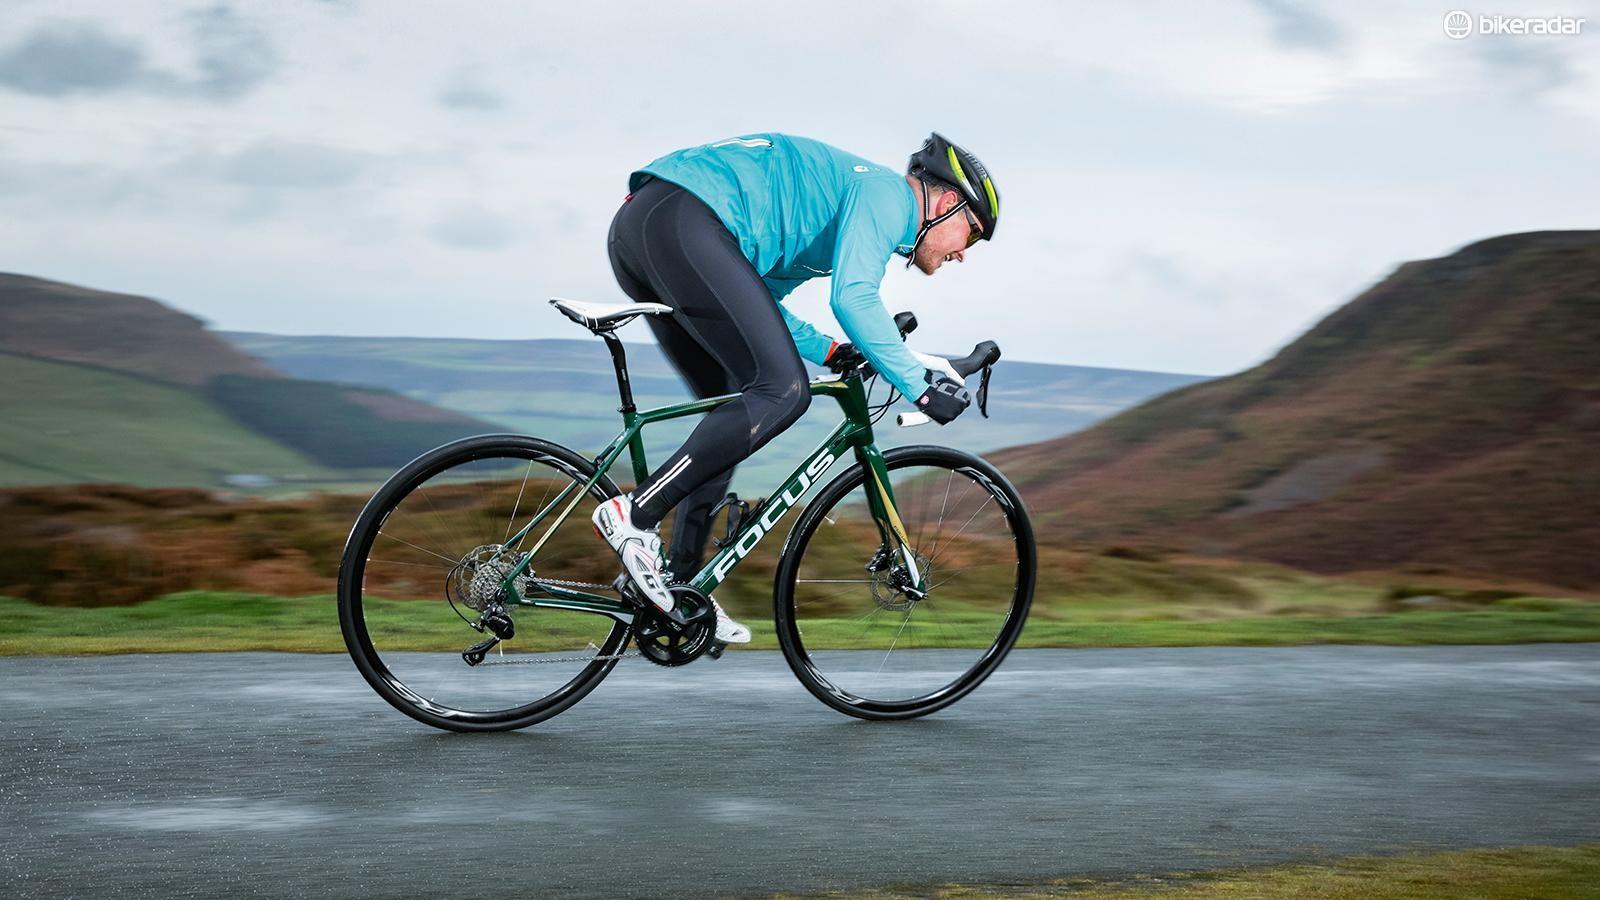 d3e0f5e7b6e Best road bikes under £2,500 for 2019 - BikeRadar